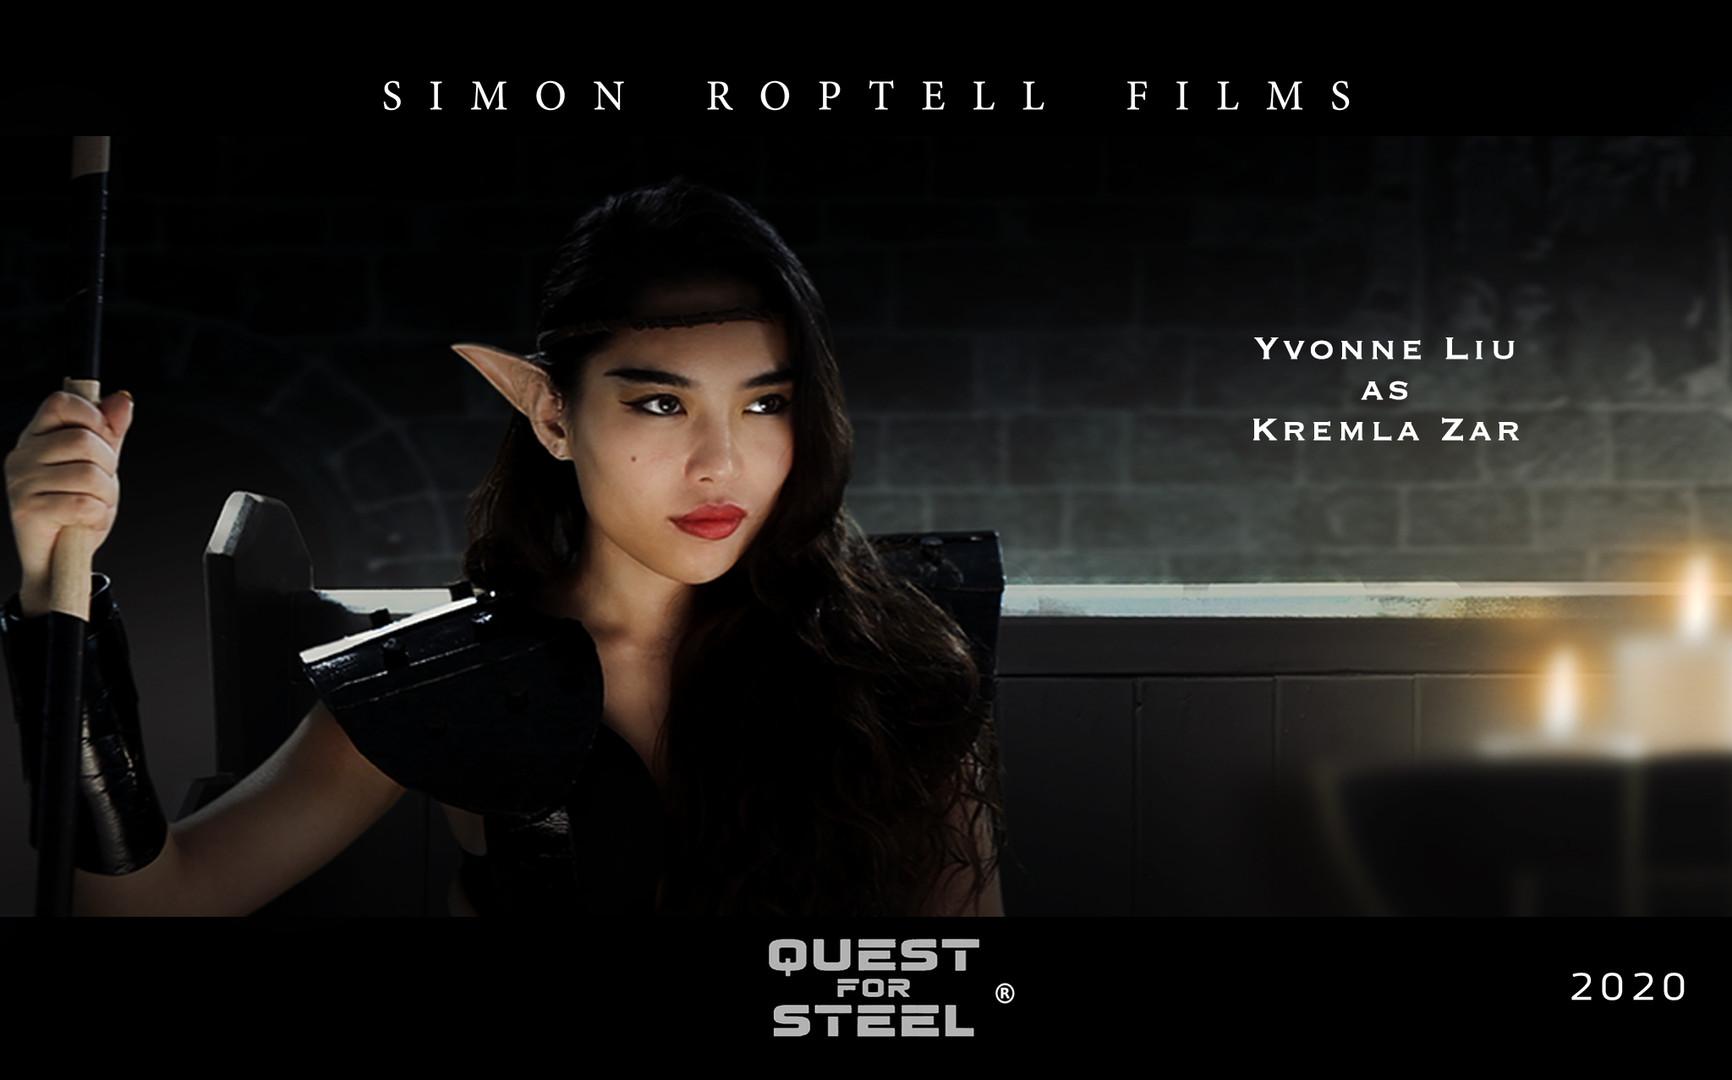 KREMLA ZAR Quest for steel. Movie about